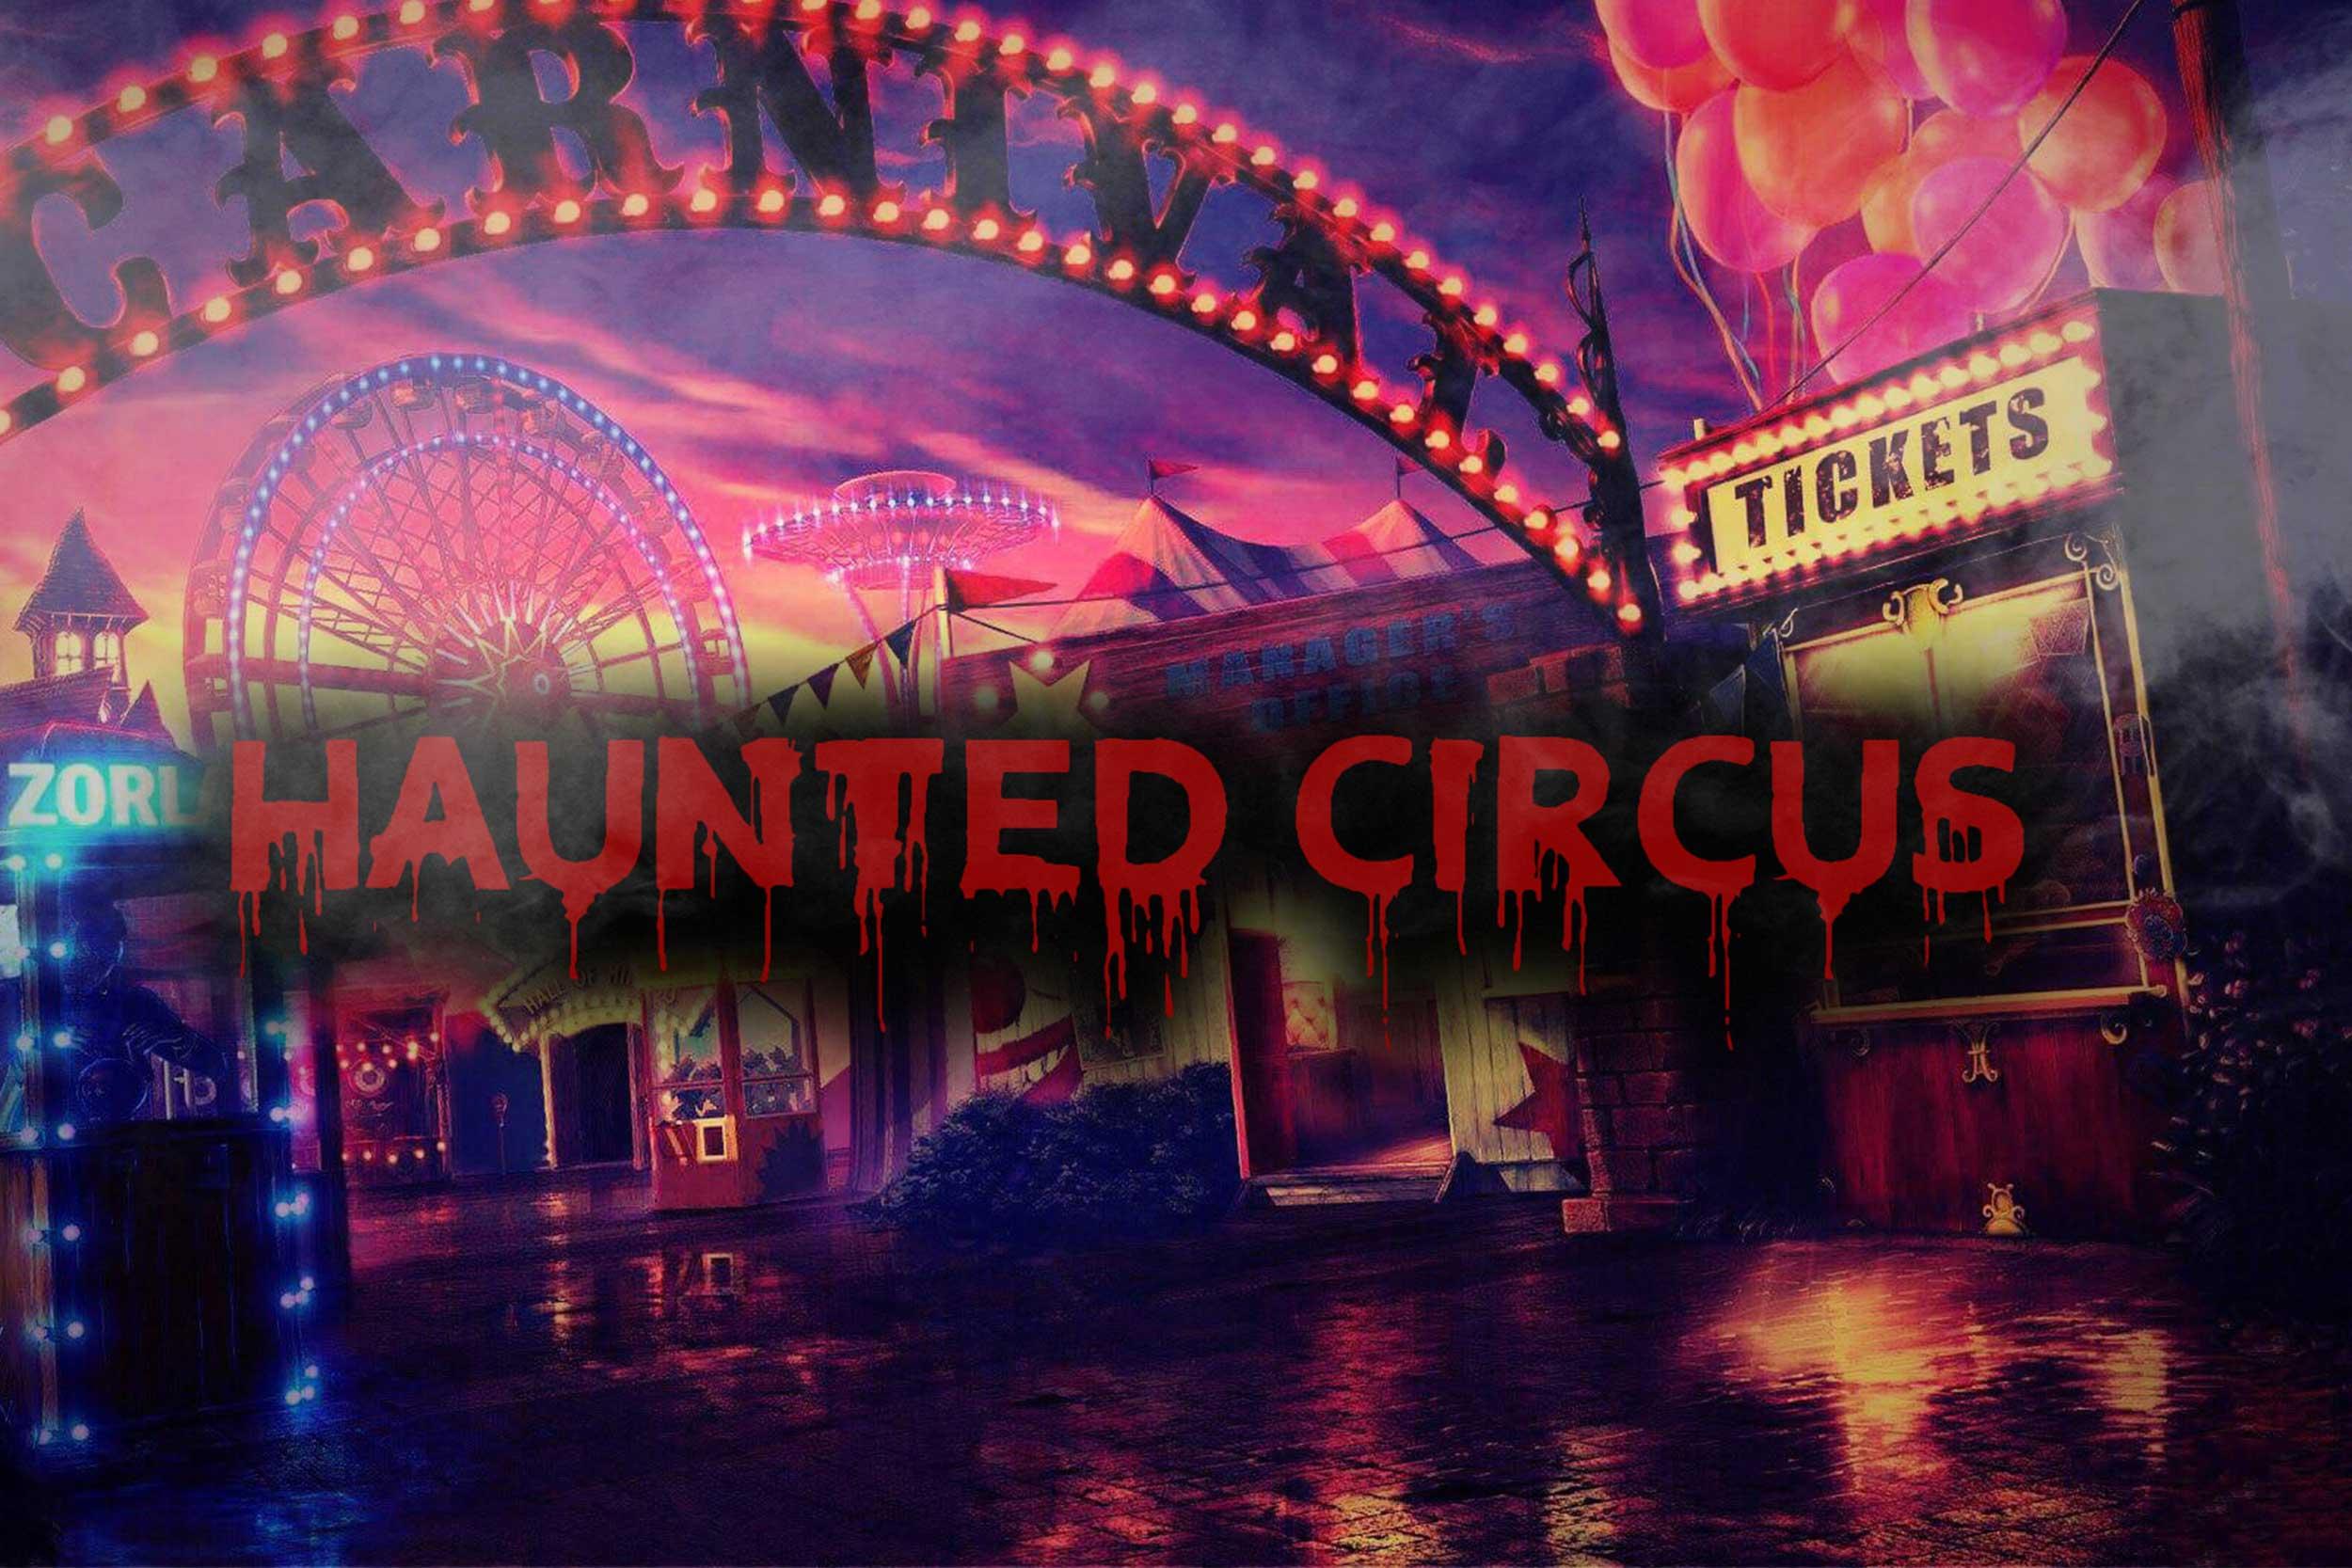 haunted-circus-4